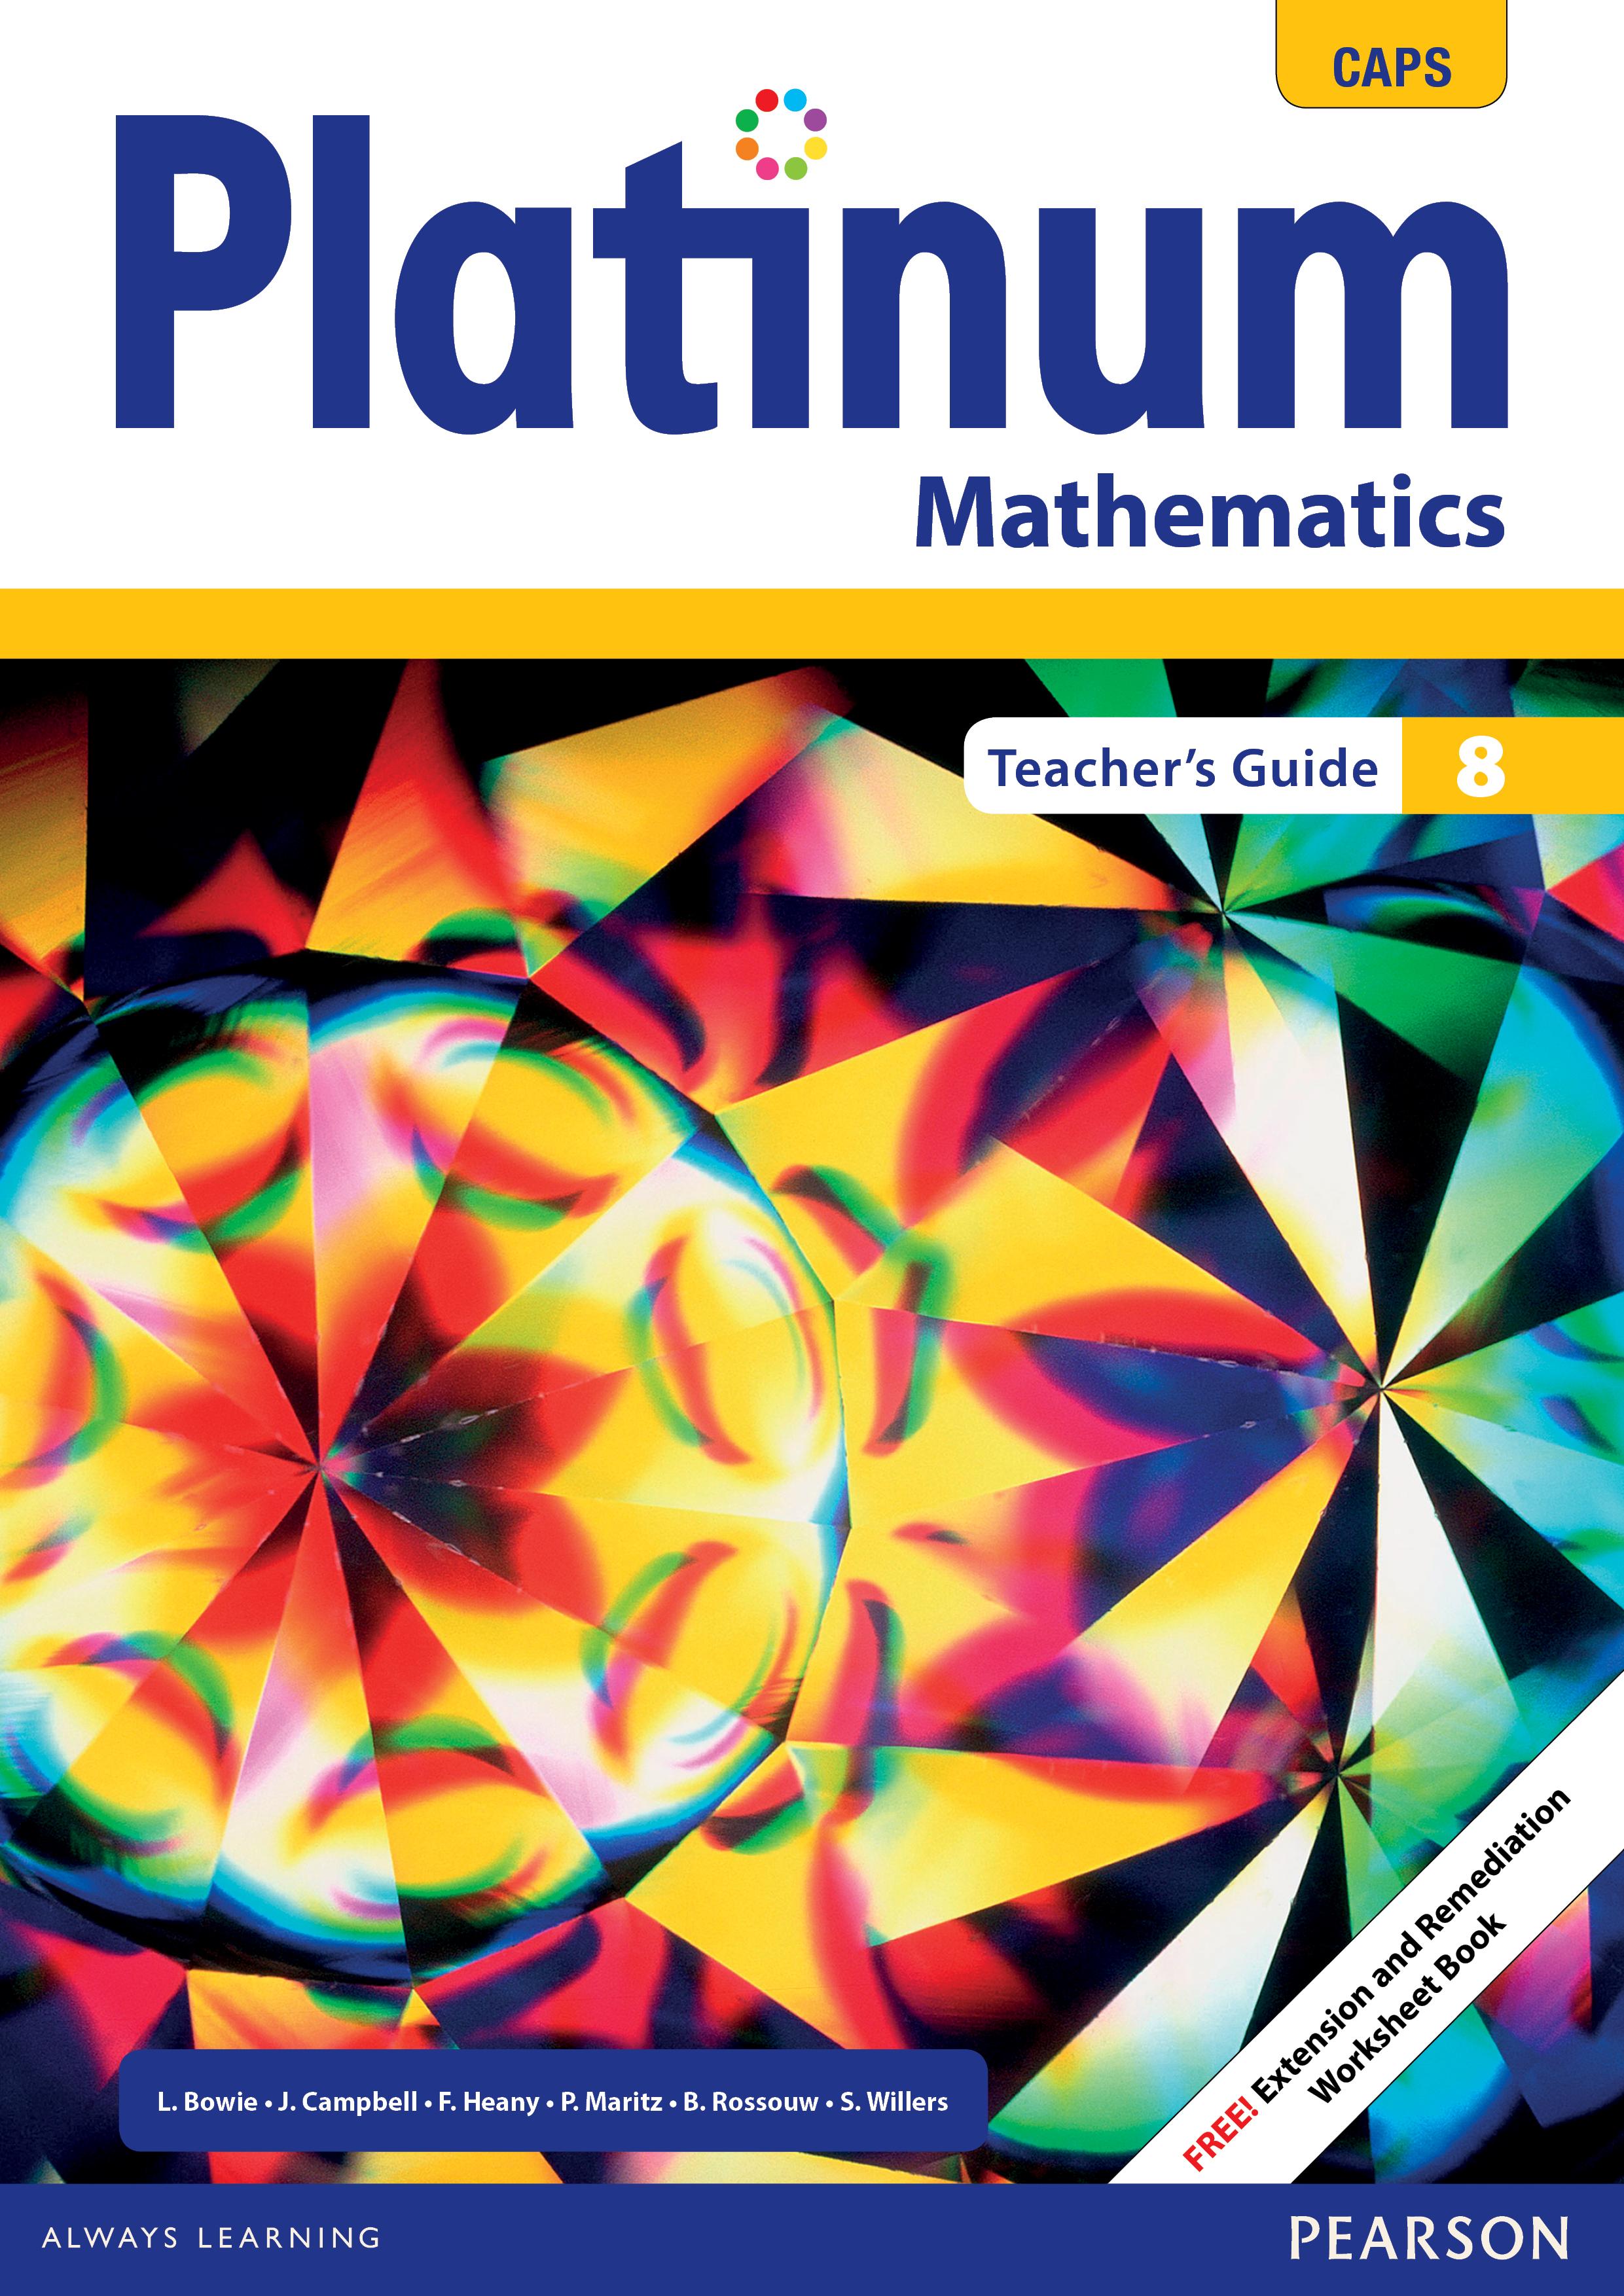 Platinum Mathematics Grade 8 Teacher's Guide ePDF (perpetual licence)